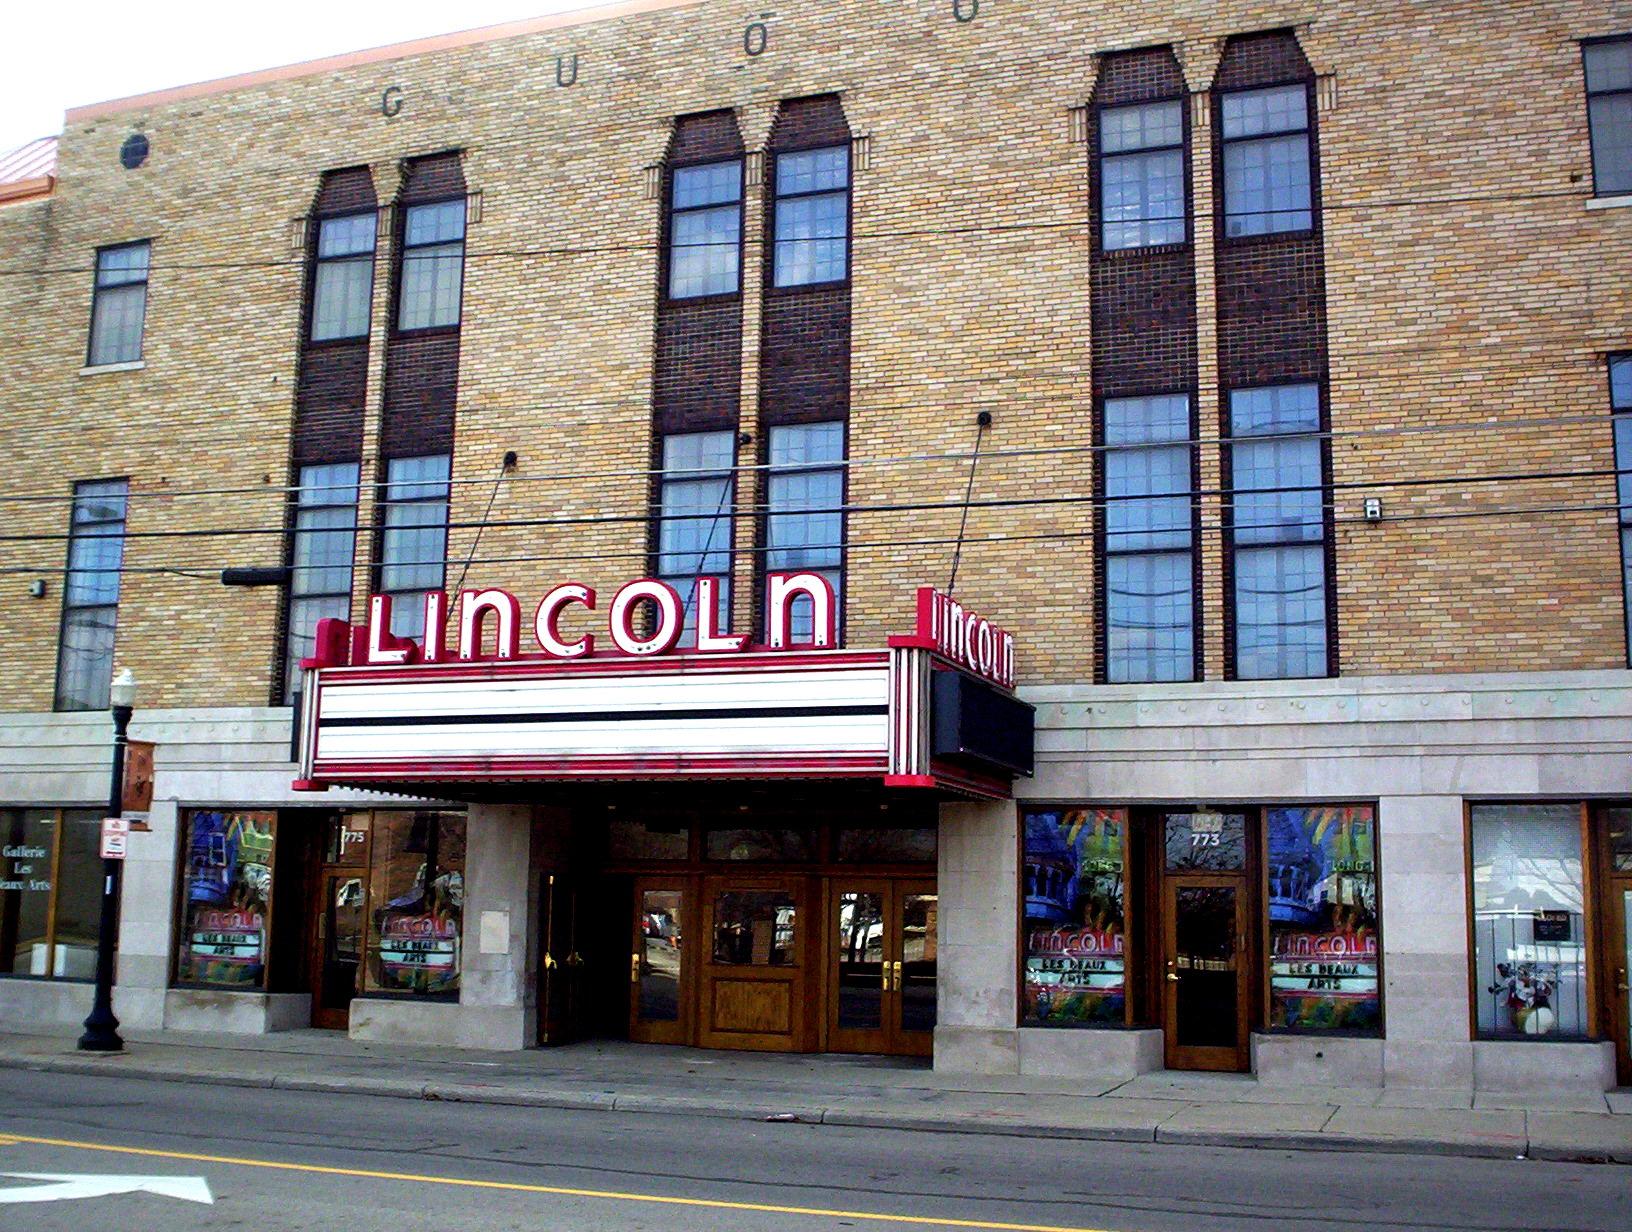 King-Lincoln Bronzeville - Wikipedia